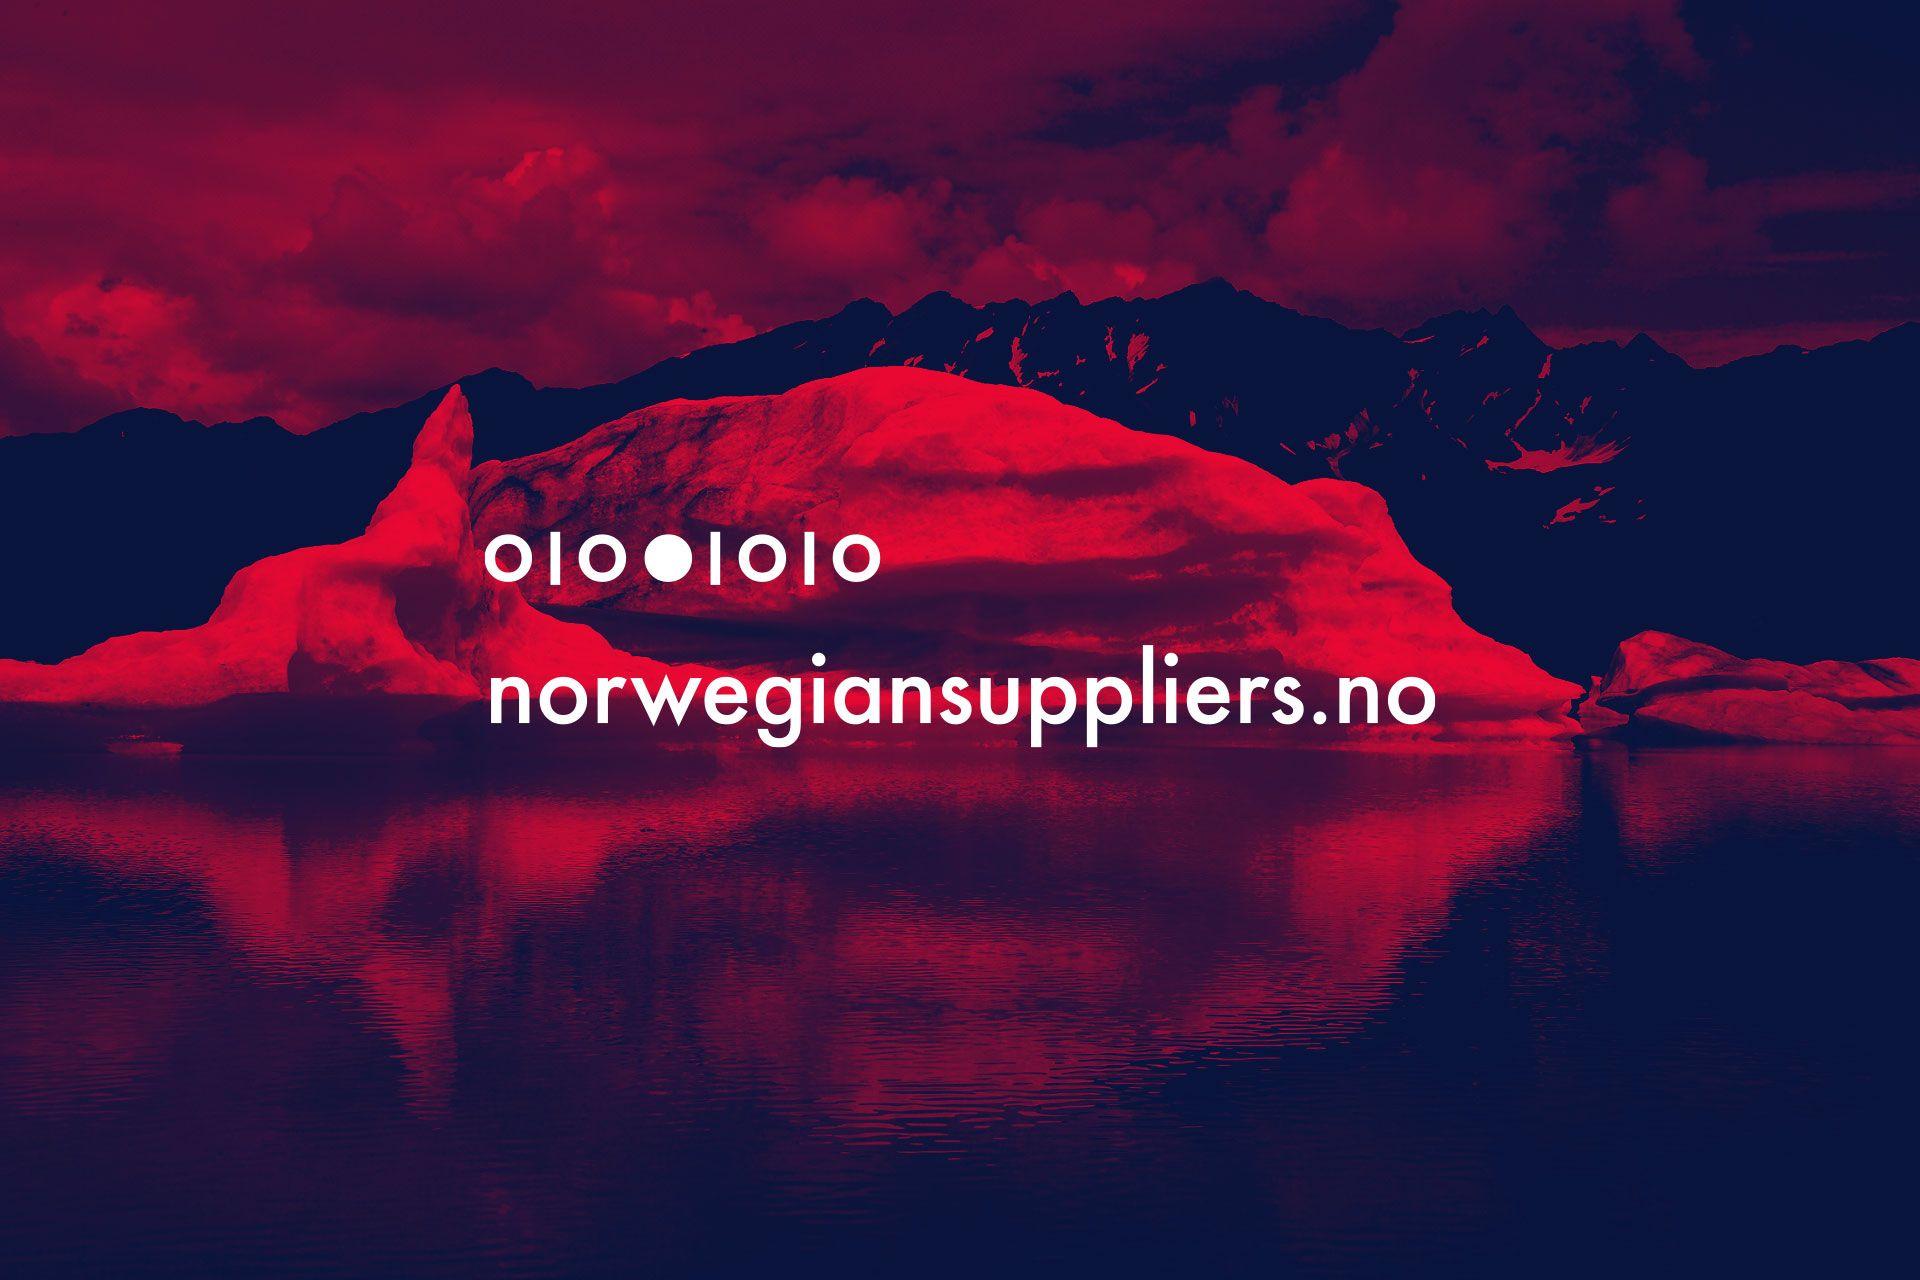 logo norwegian supplieres